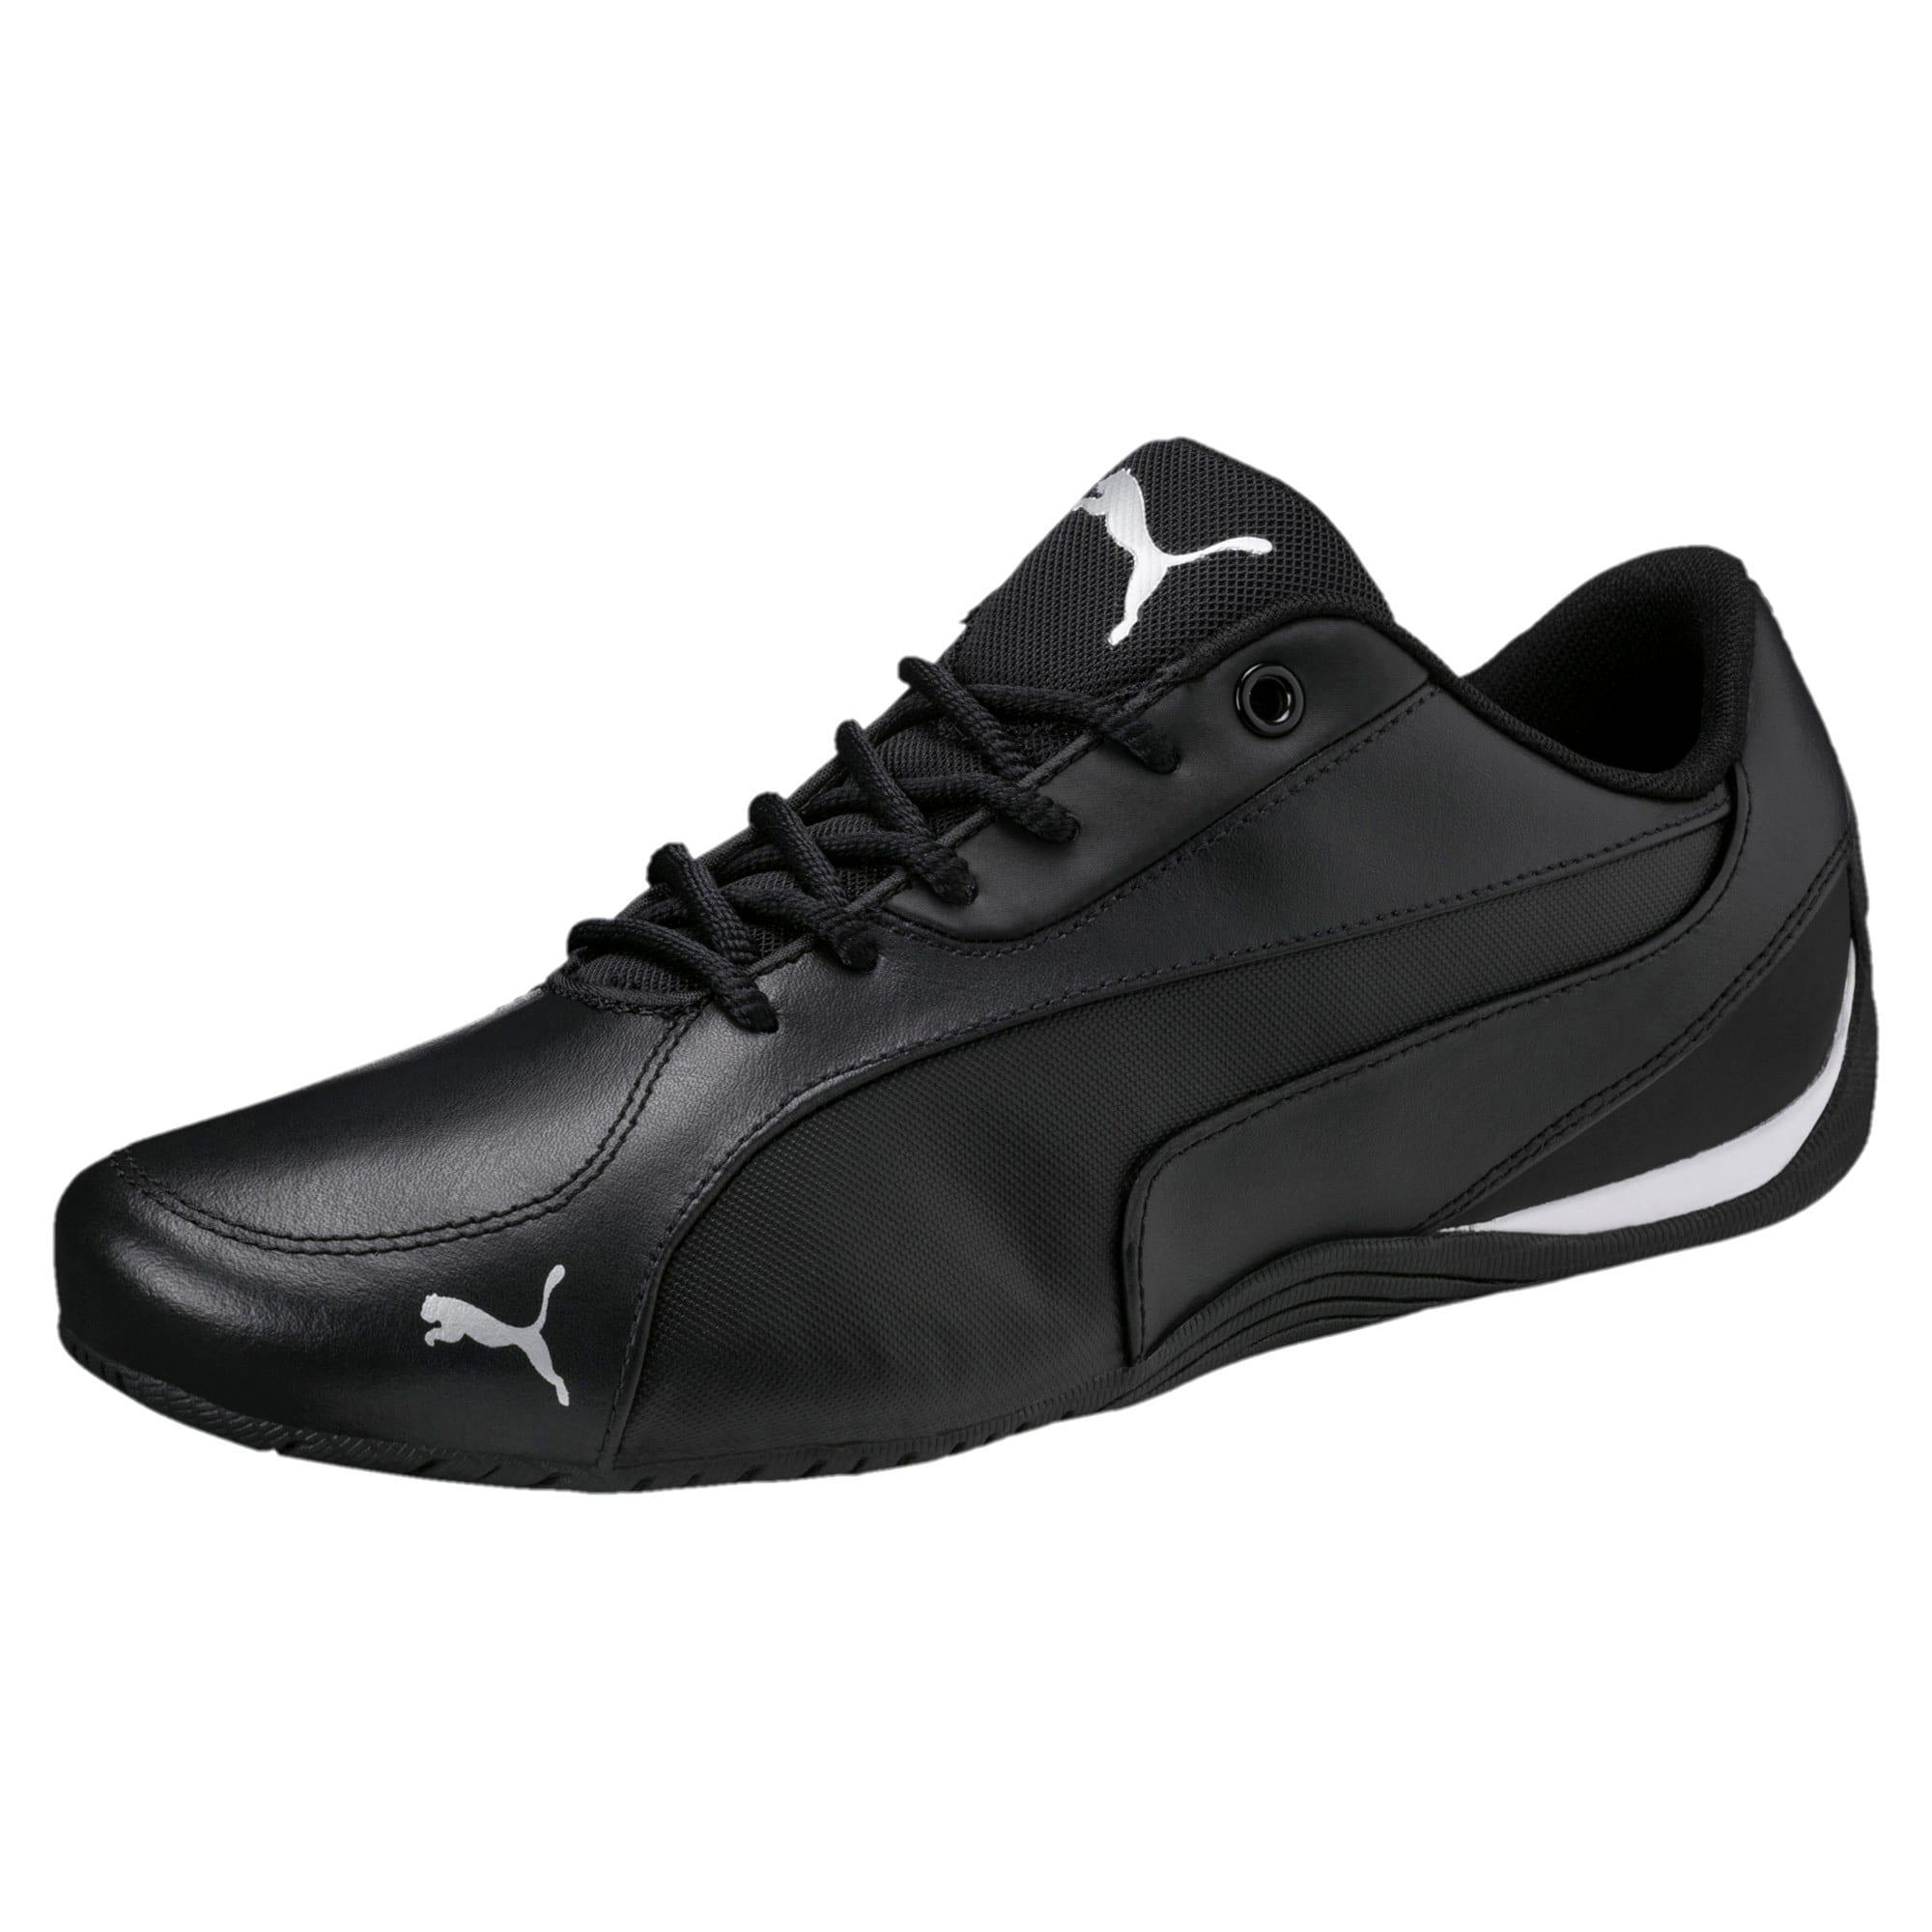 Miniatura 1 de Zapatos Drift Cat 5 Core , Puma Black, mediano